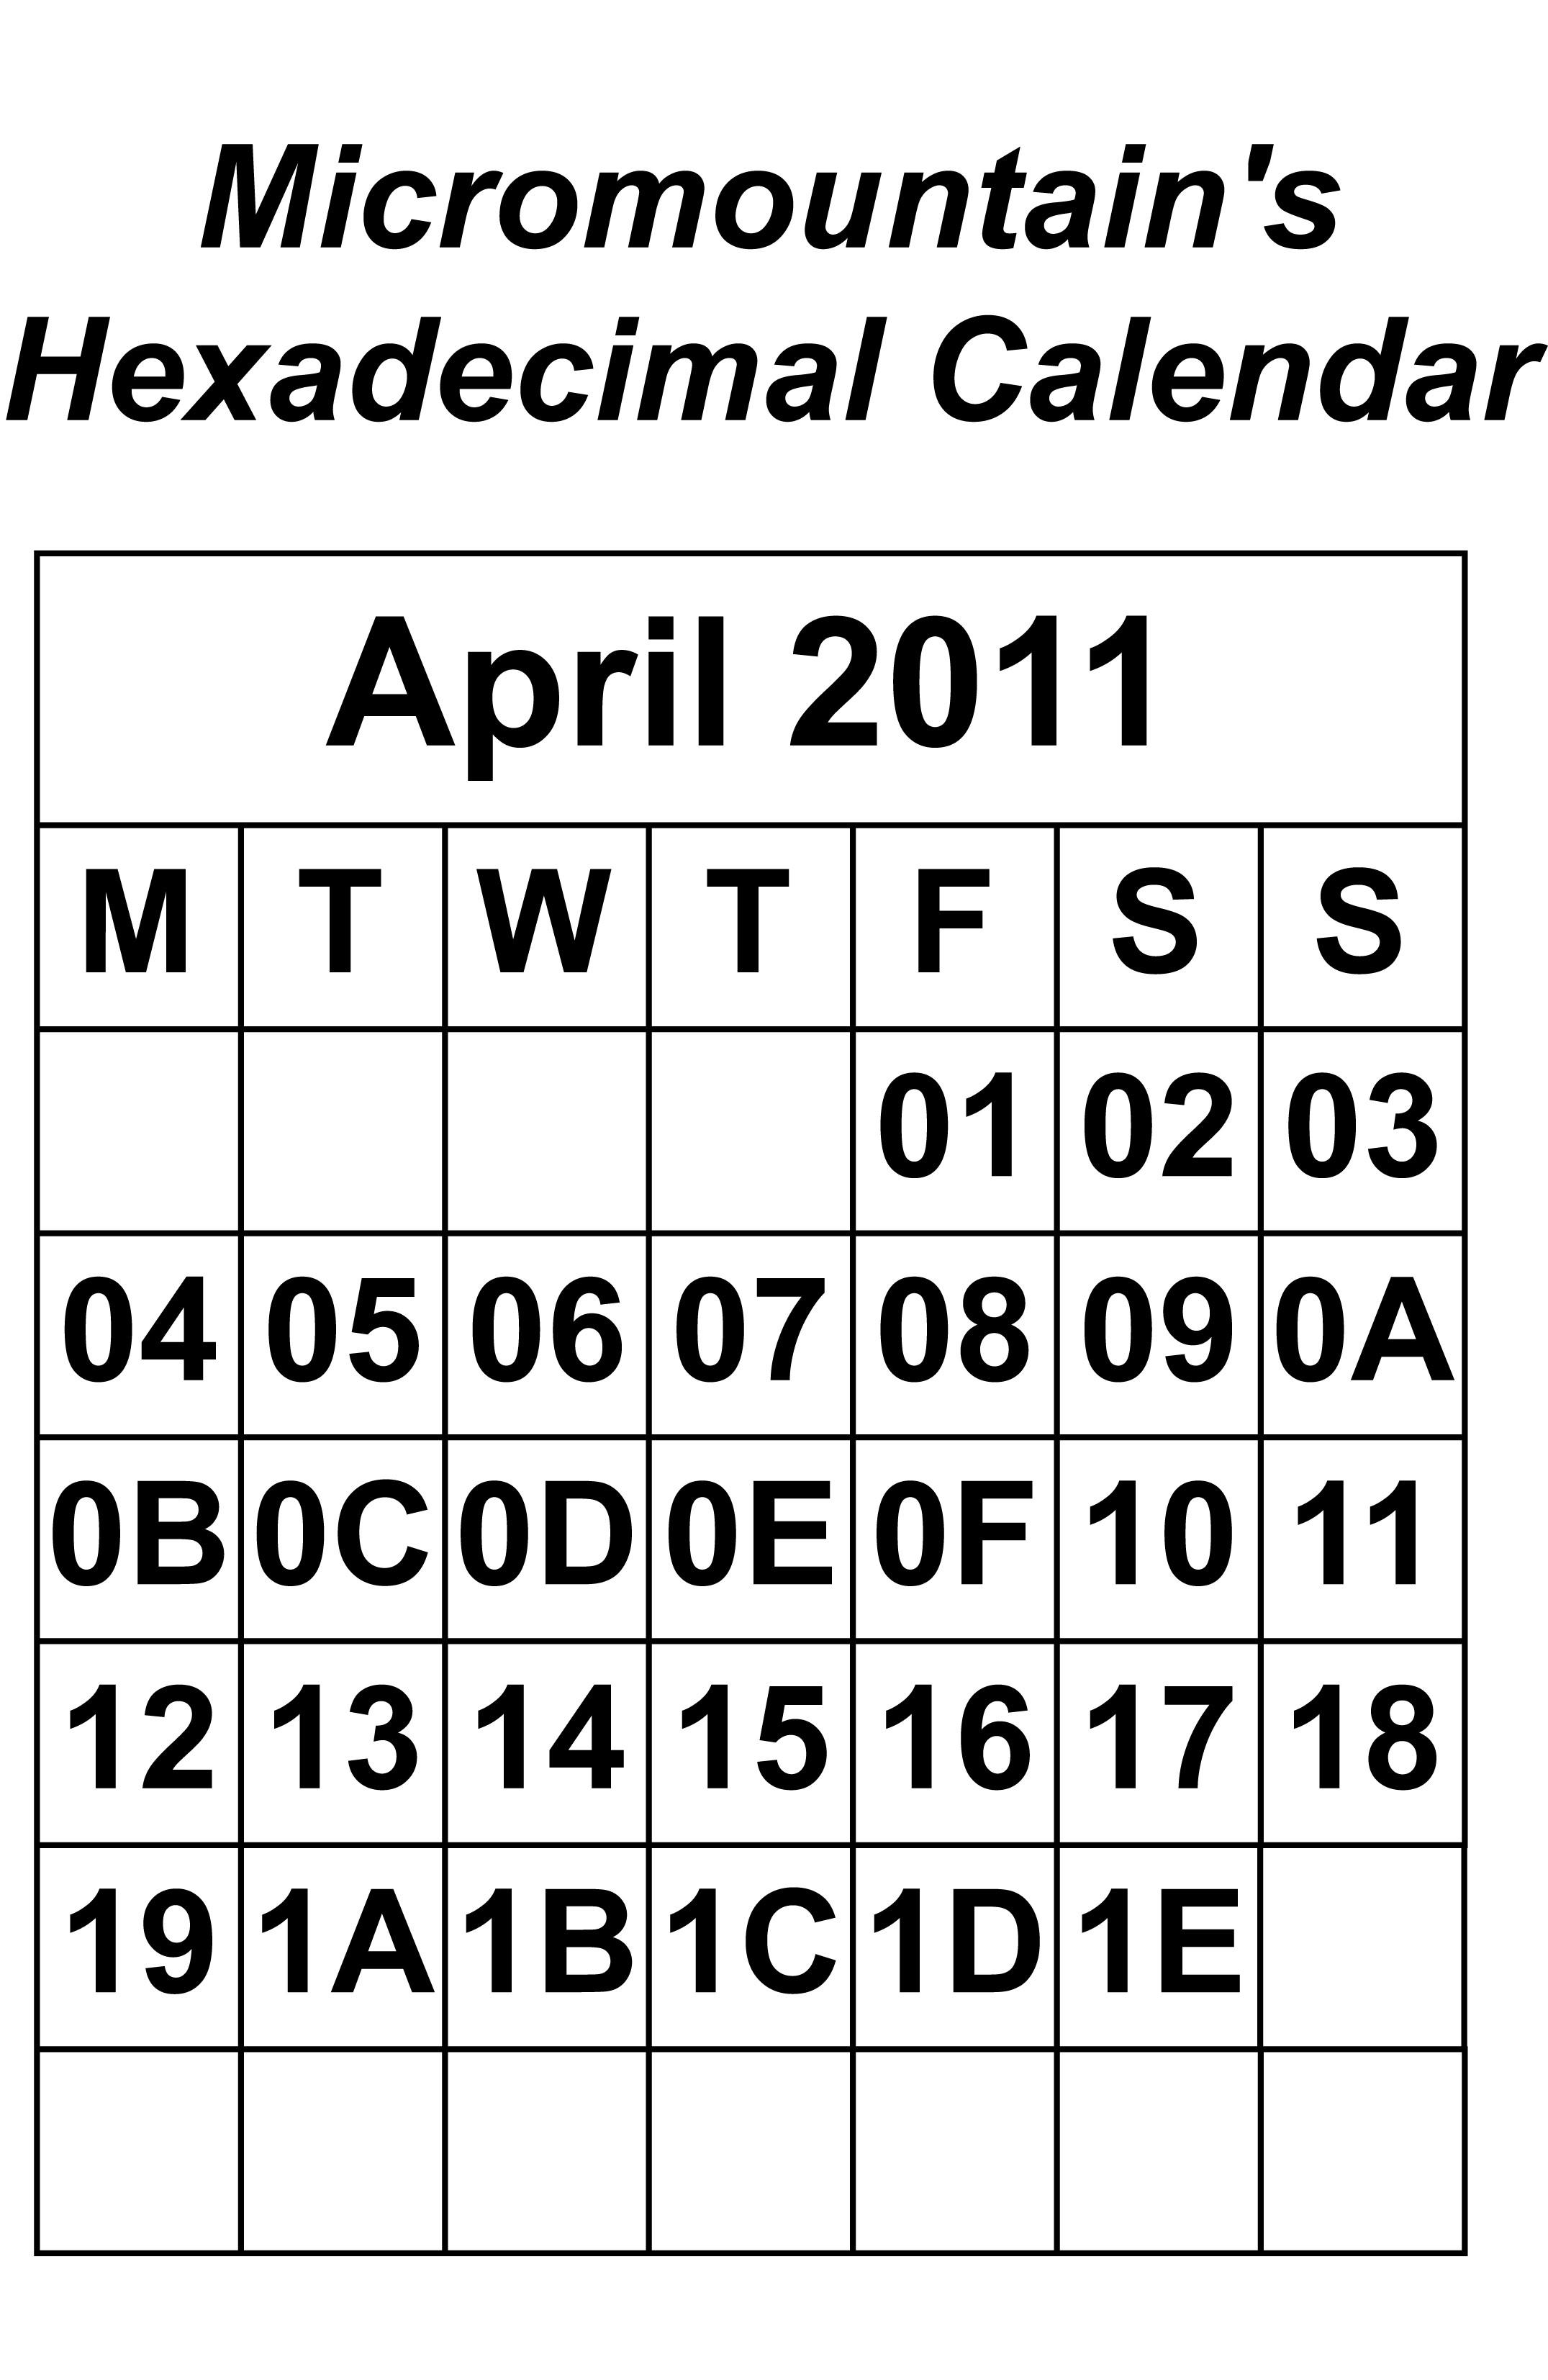 March Calendar Print Out Más Recientemente Liberado Hexadecimal Calendar A4 Of March Calendar Print Out Recientes Monthly Calendar 2015 Template Printable 2016 Calendar Templates